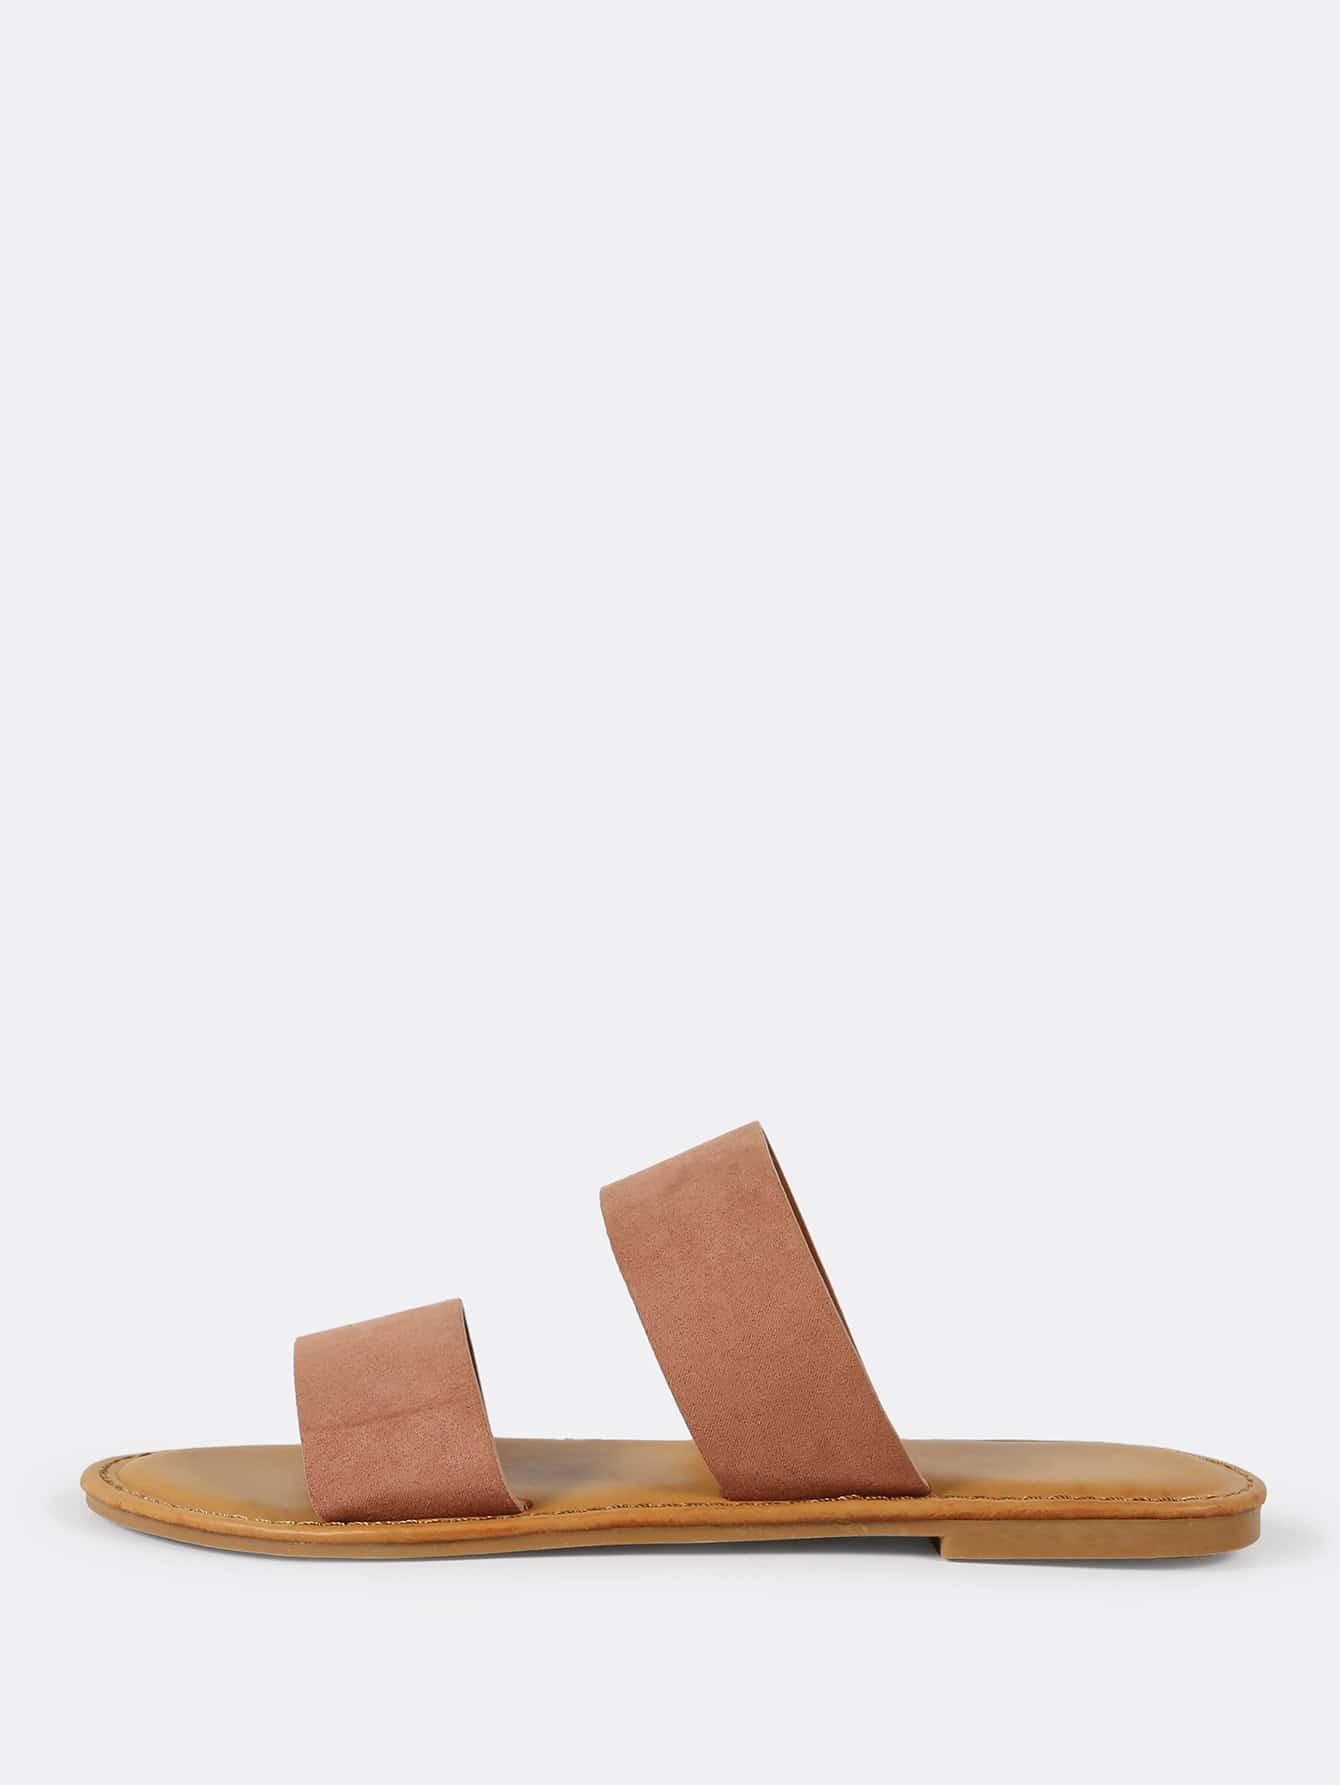 Faux Suede Double Band Slide Sandal MOCHA шлепанцы женские soludos knotted slide sandal ivory